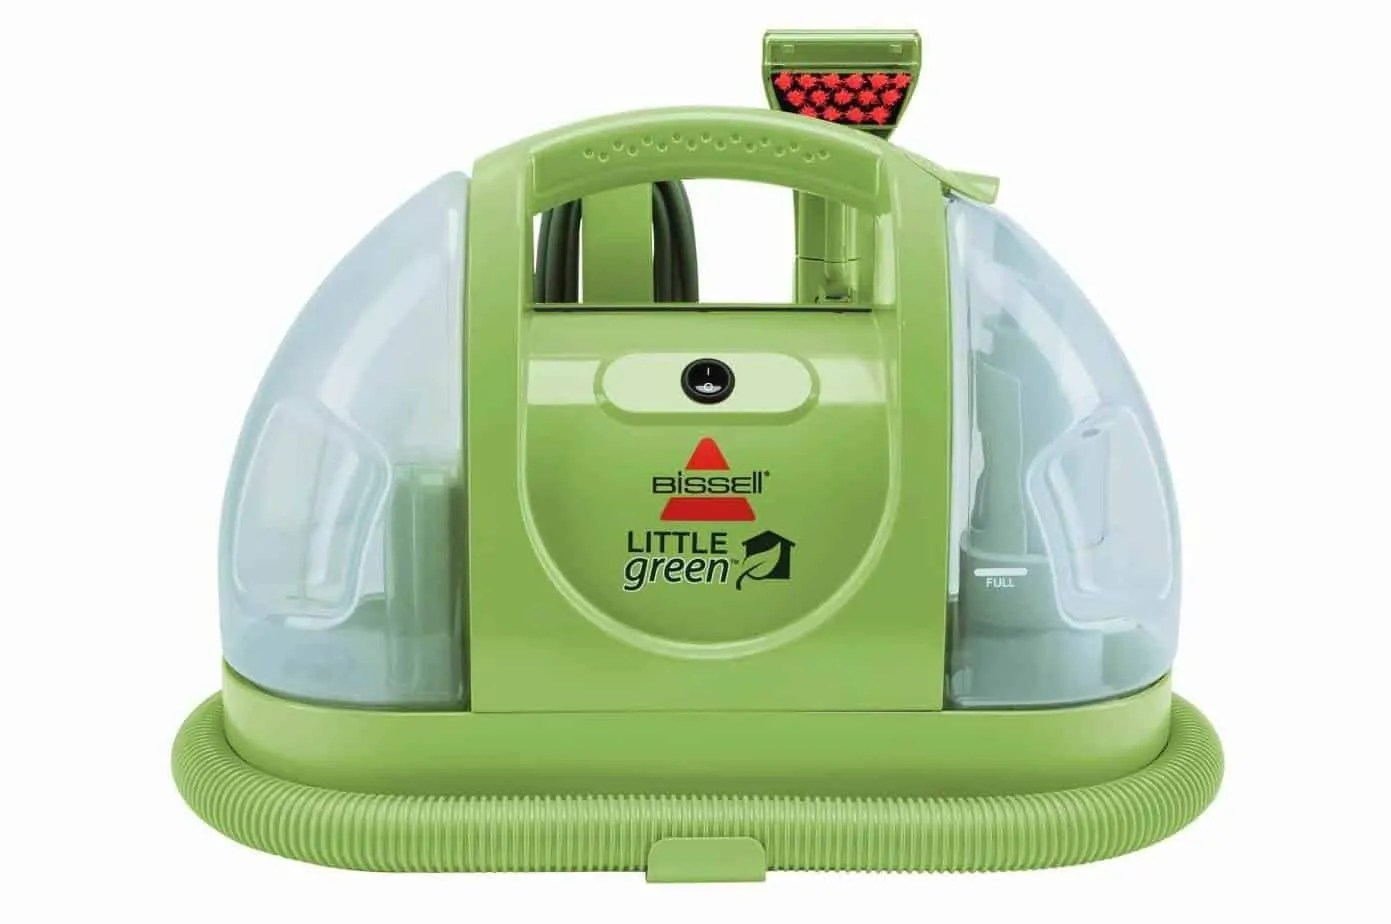 Best Handheld Carpet Cleaner Top UK Portable Washers Reviewed